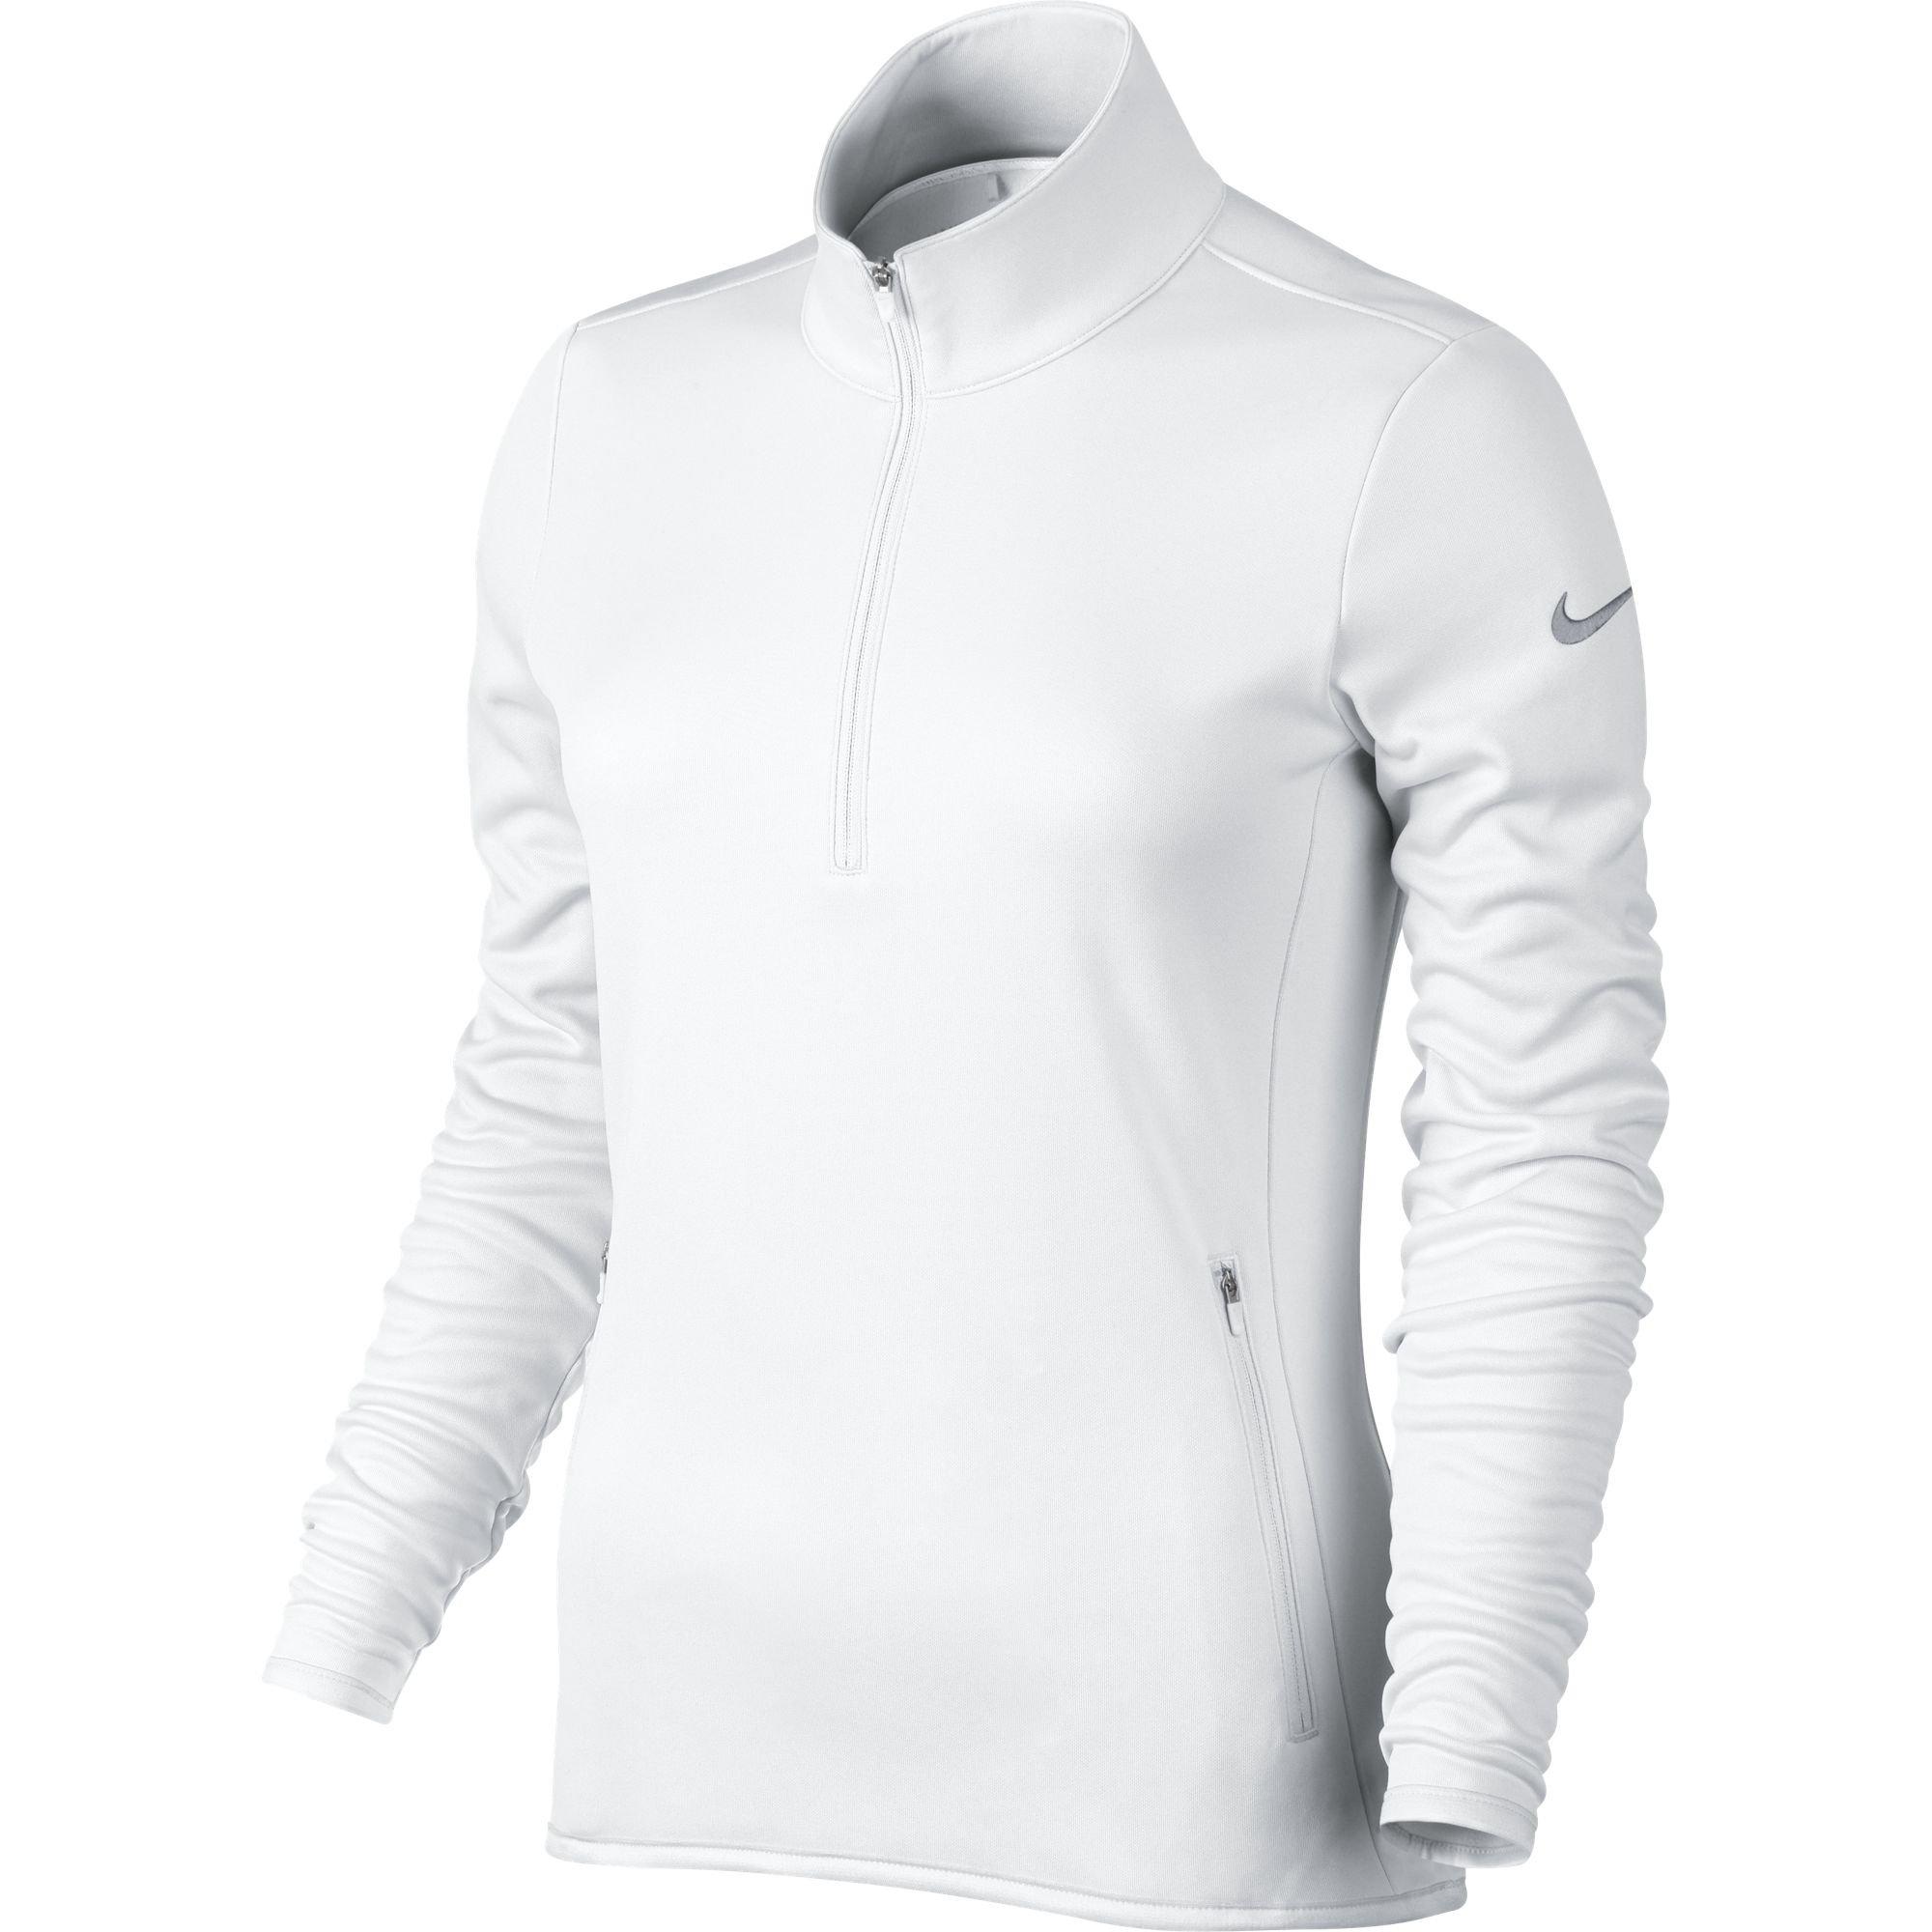 NIKE Women's Thermal 1/2 Zip Top, White/White/Wolf Grey, Medium